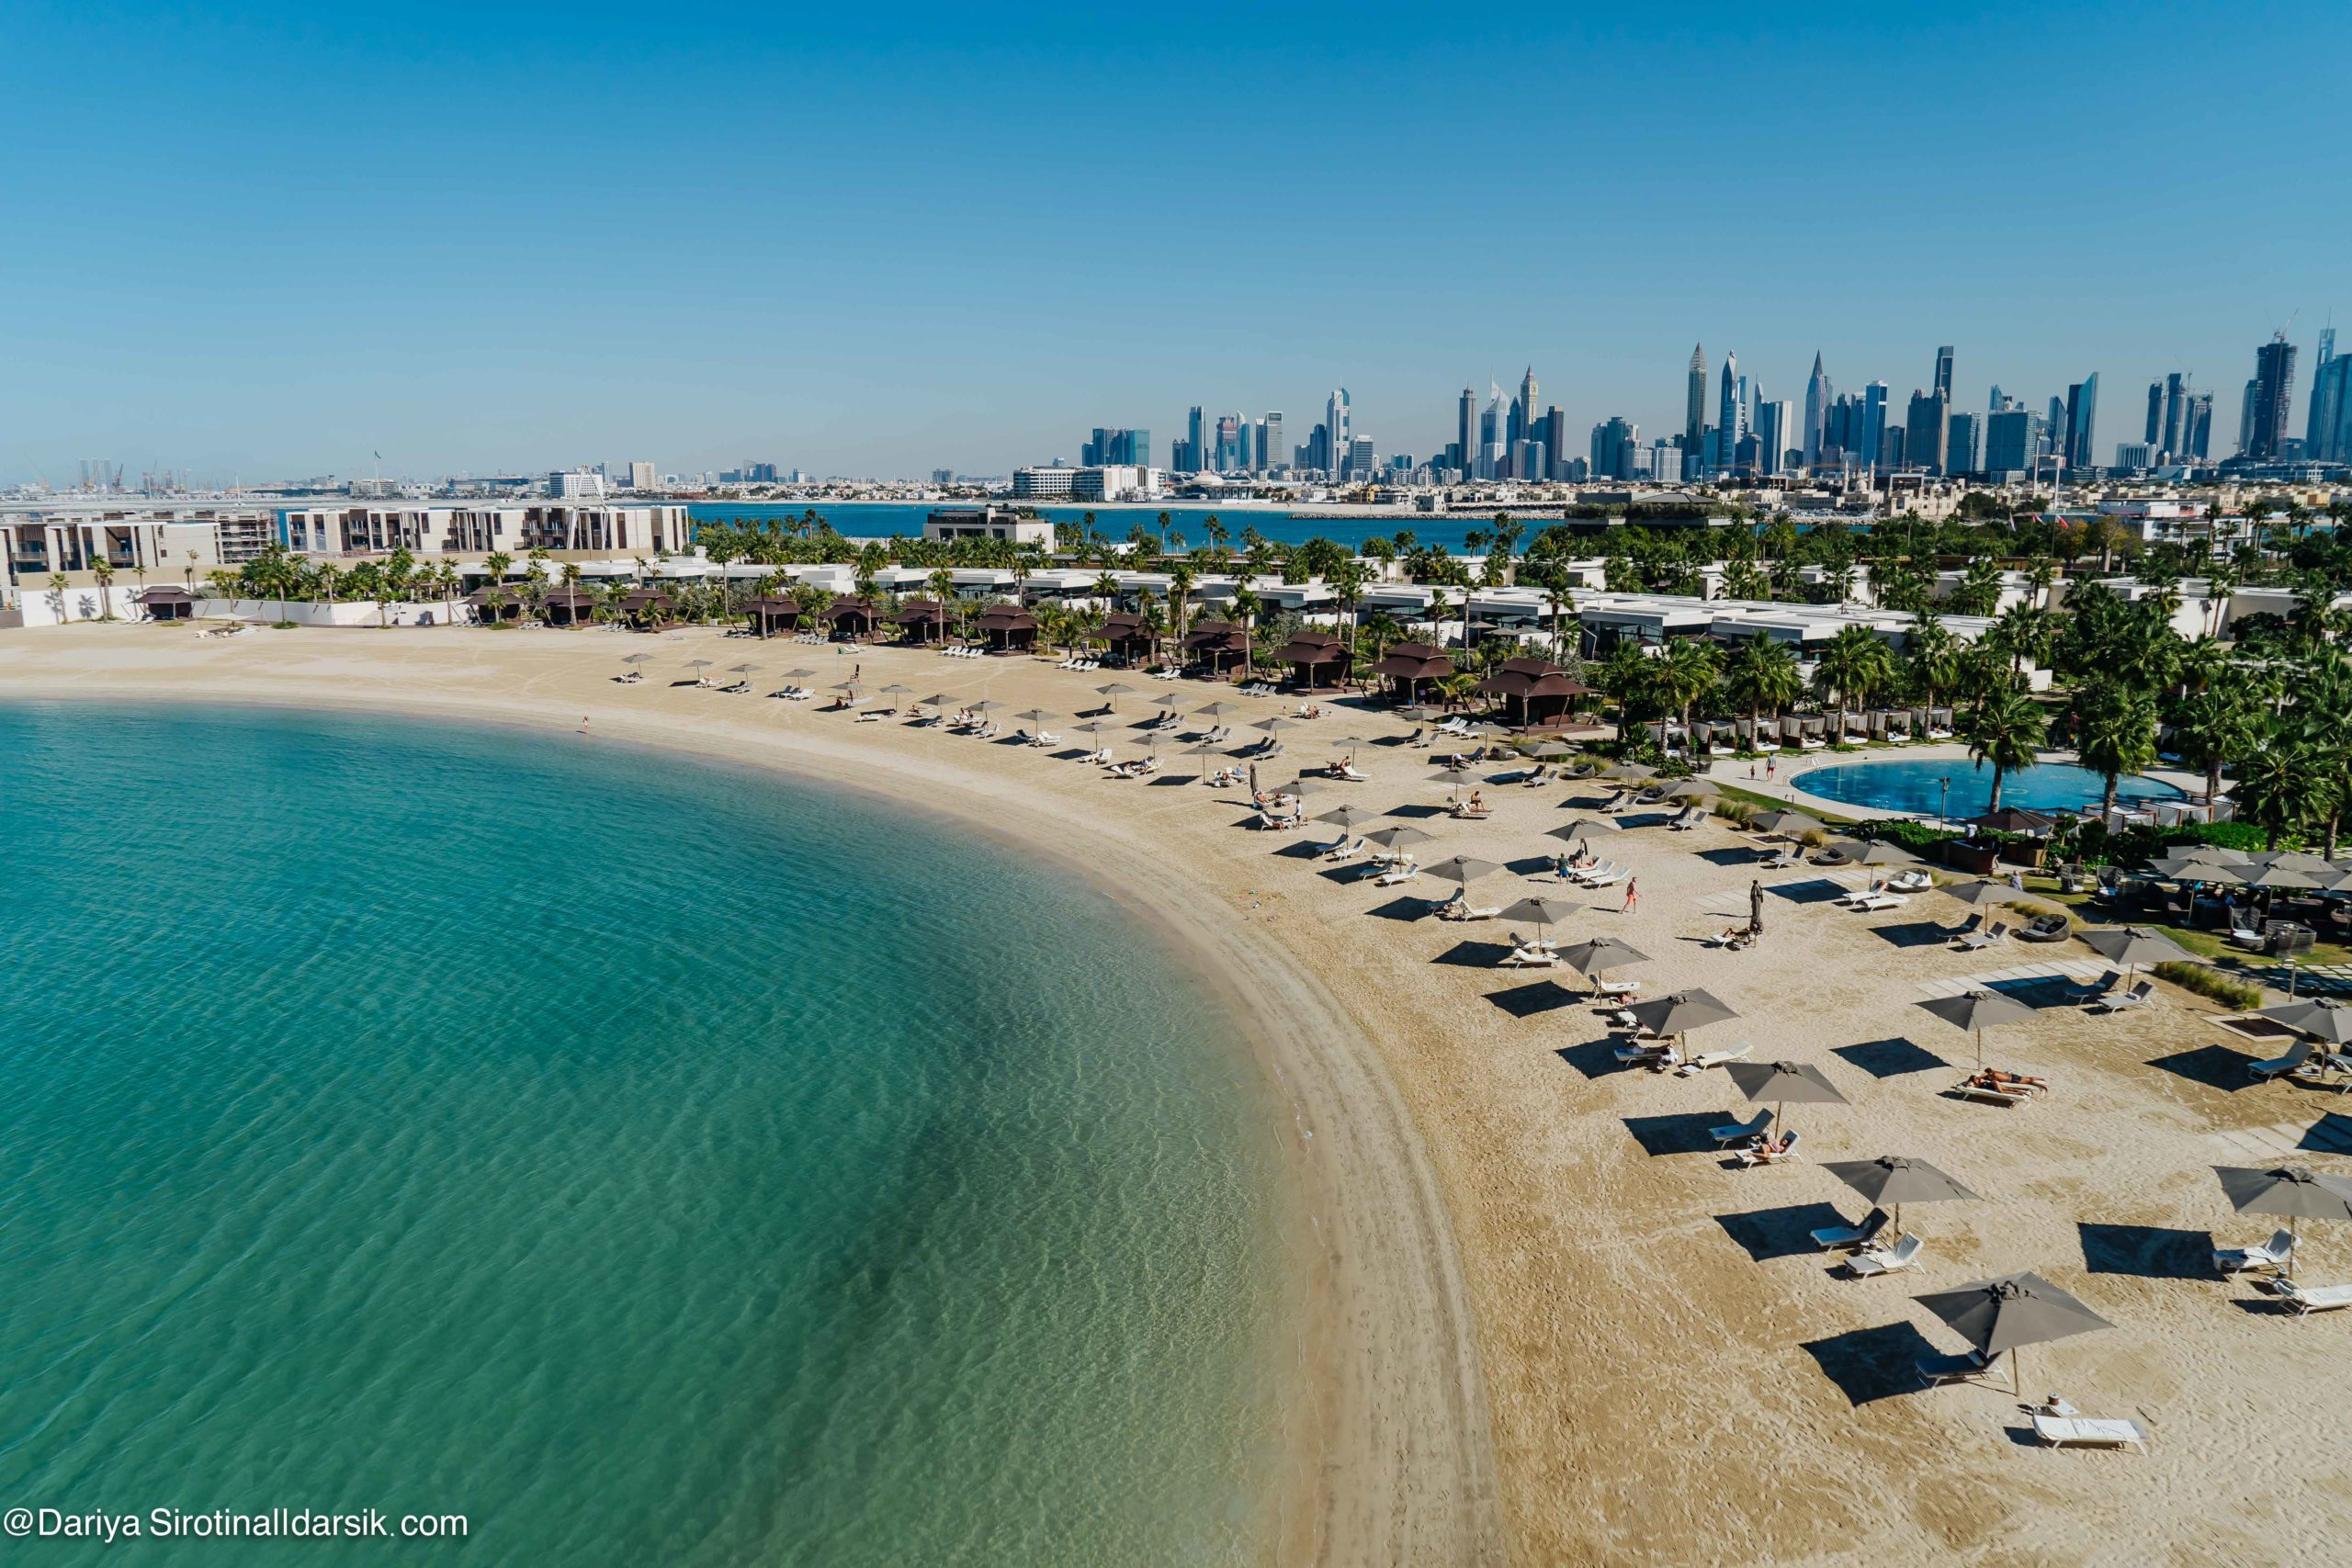 Дубай: каникулы в стиле постмодерн